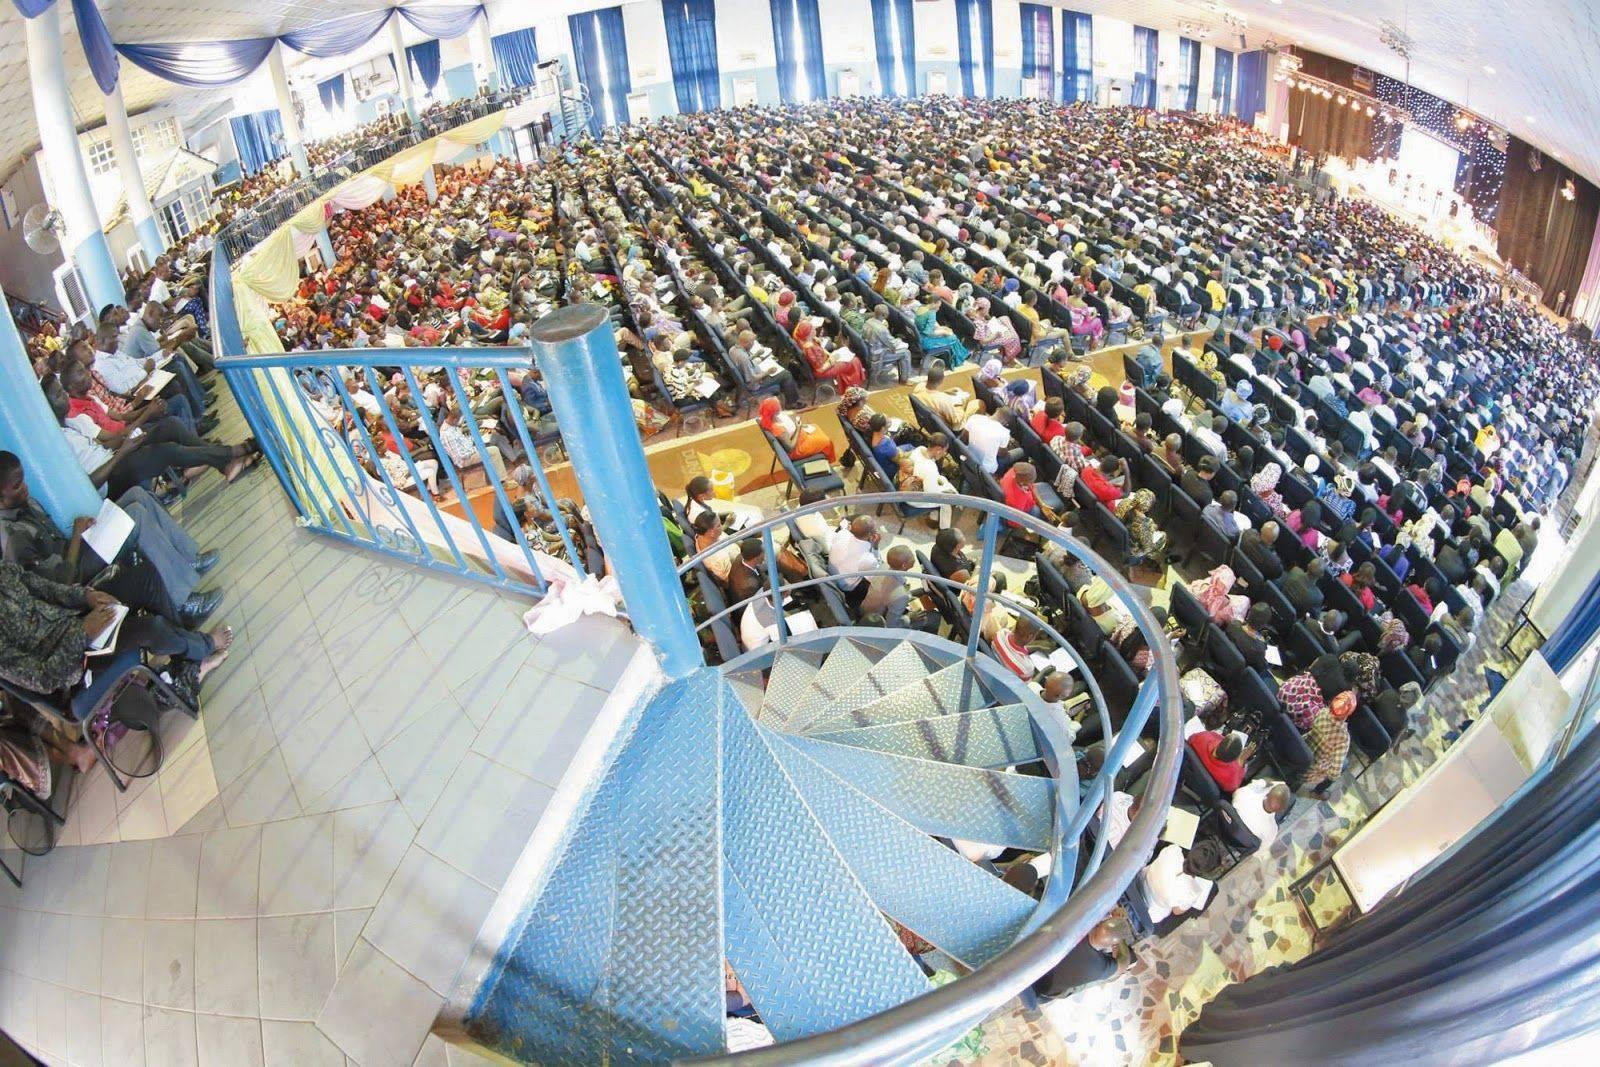 Dunamis International Gospel Centre, Abuja1